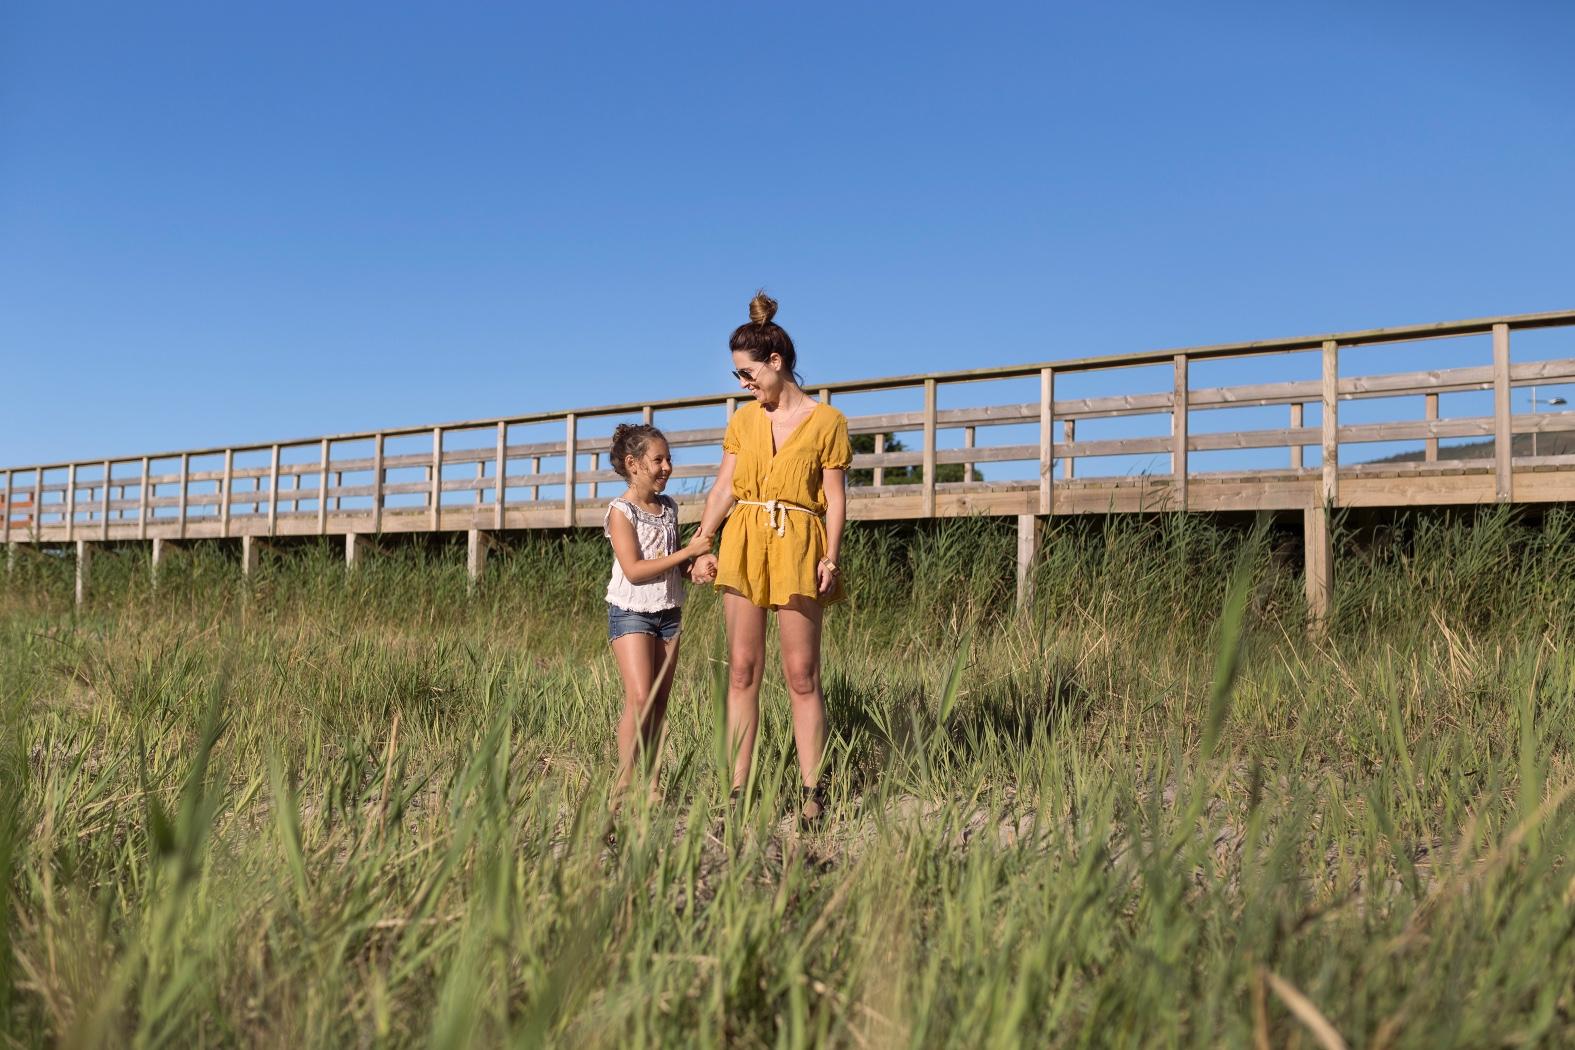 descalzaporelparque-ZARA -Mango Kids-Zippy-ZARA KIDS-rayban-una auténtica aventura-jimena and me-playa-style-fashion-lifestyle-coruña-bloggers-madre e hija -stylelovely